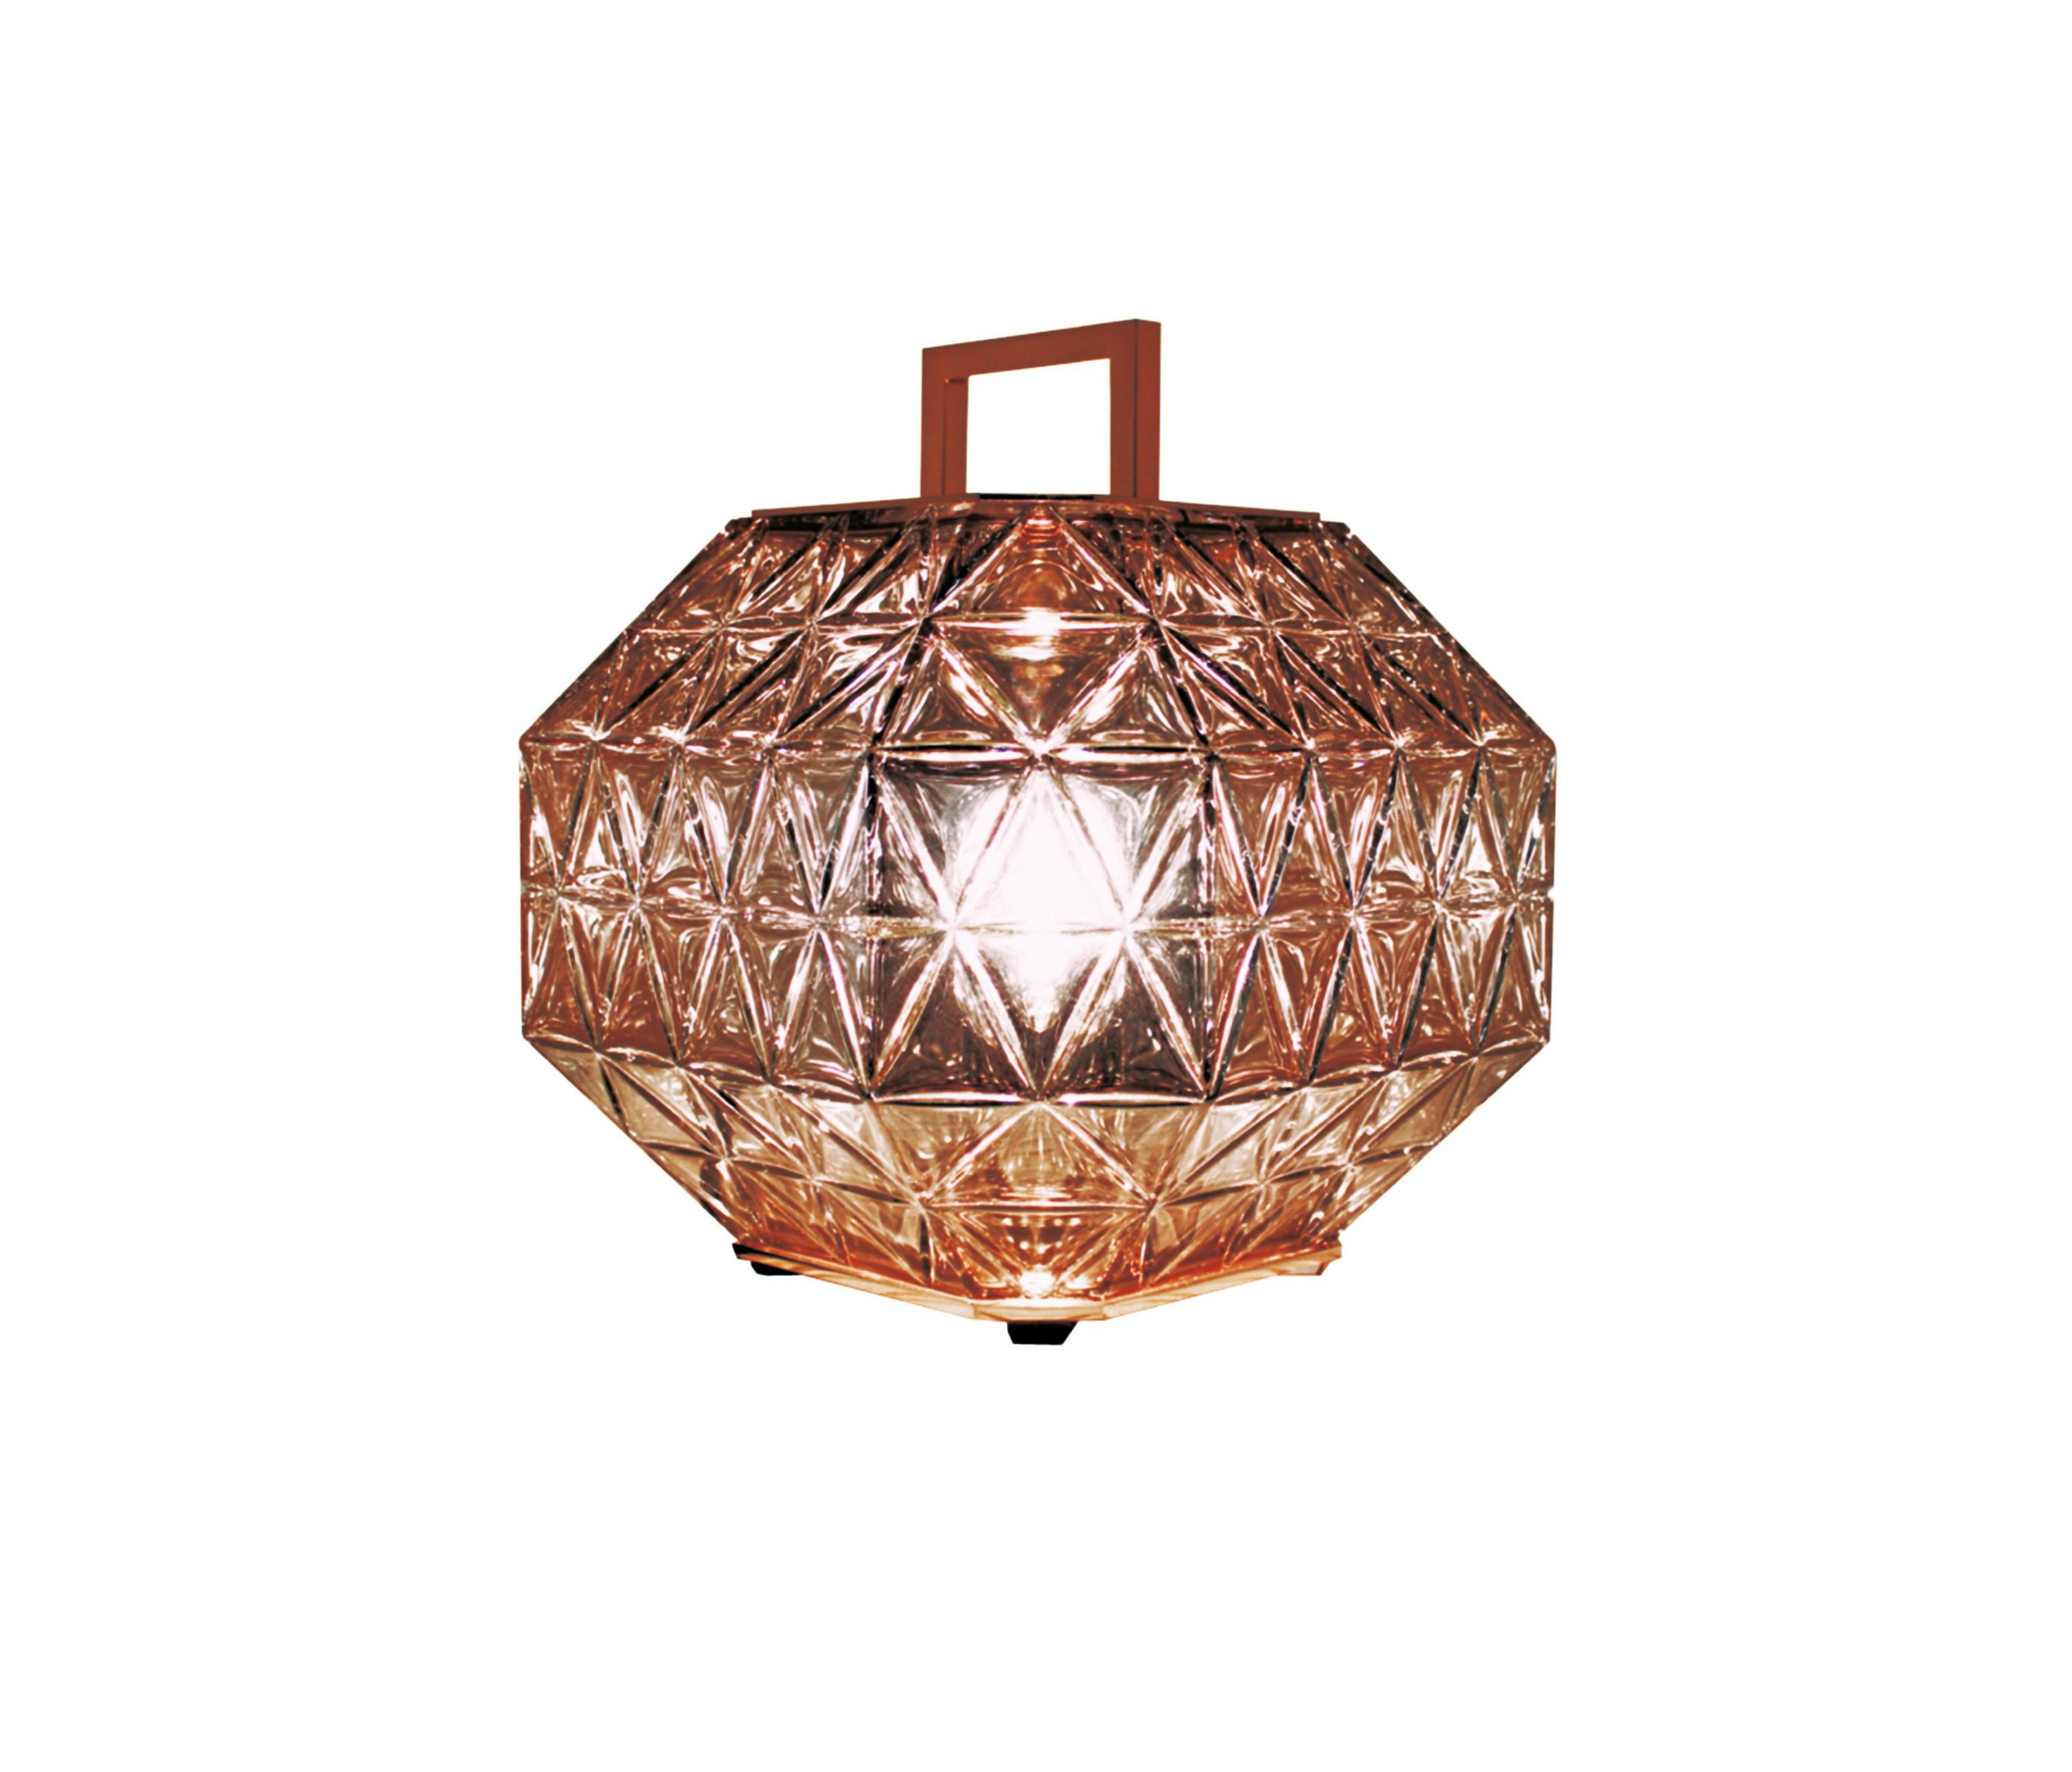 treasure ta deluxe general lighting from contardi. Black Bedroom Furniture Sets. Home Design Ideas